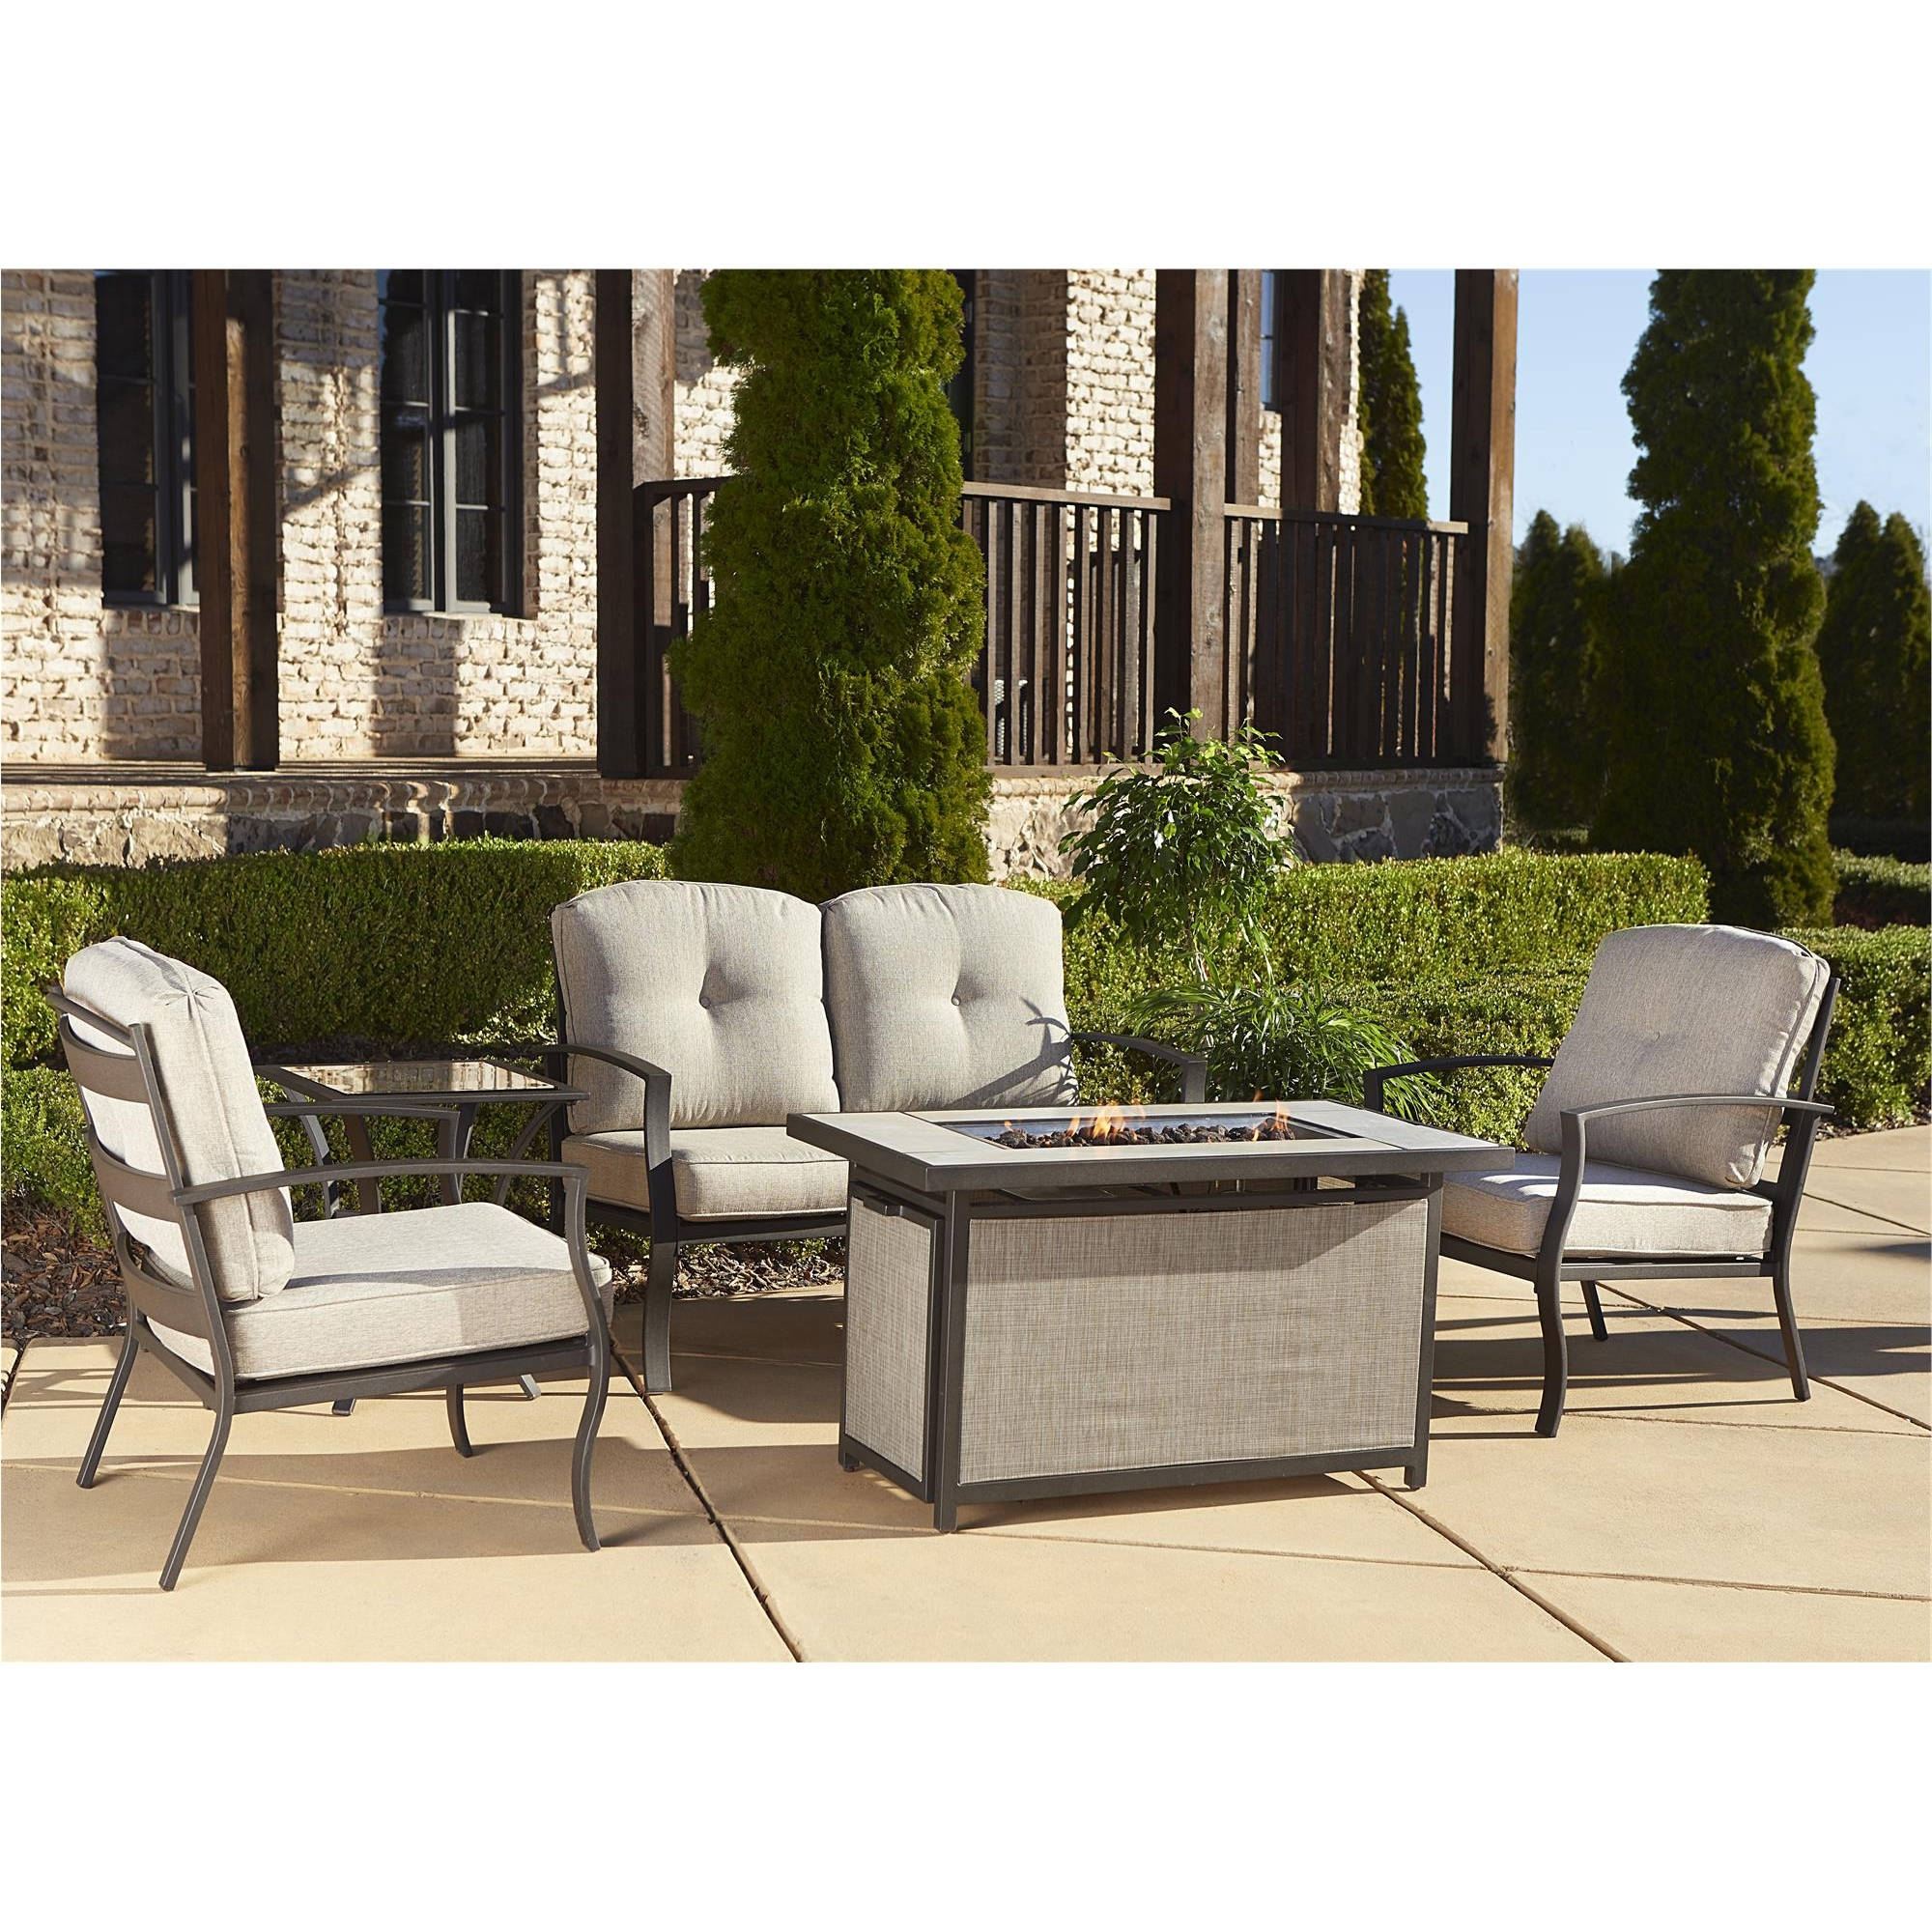 Current Dot Patio Conversation Sets Inside Cosco Outdoor 5 Piece Serene Ridge Aluminum Patio Furniture (View 3 of 20)